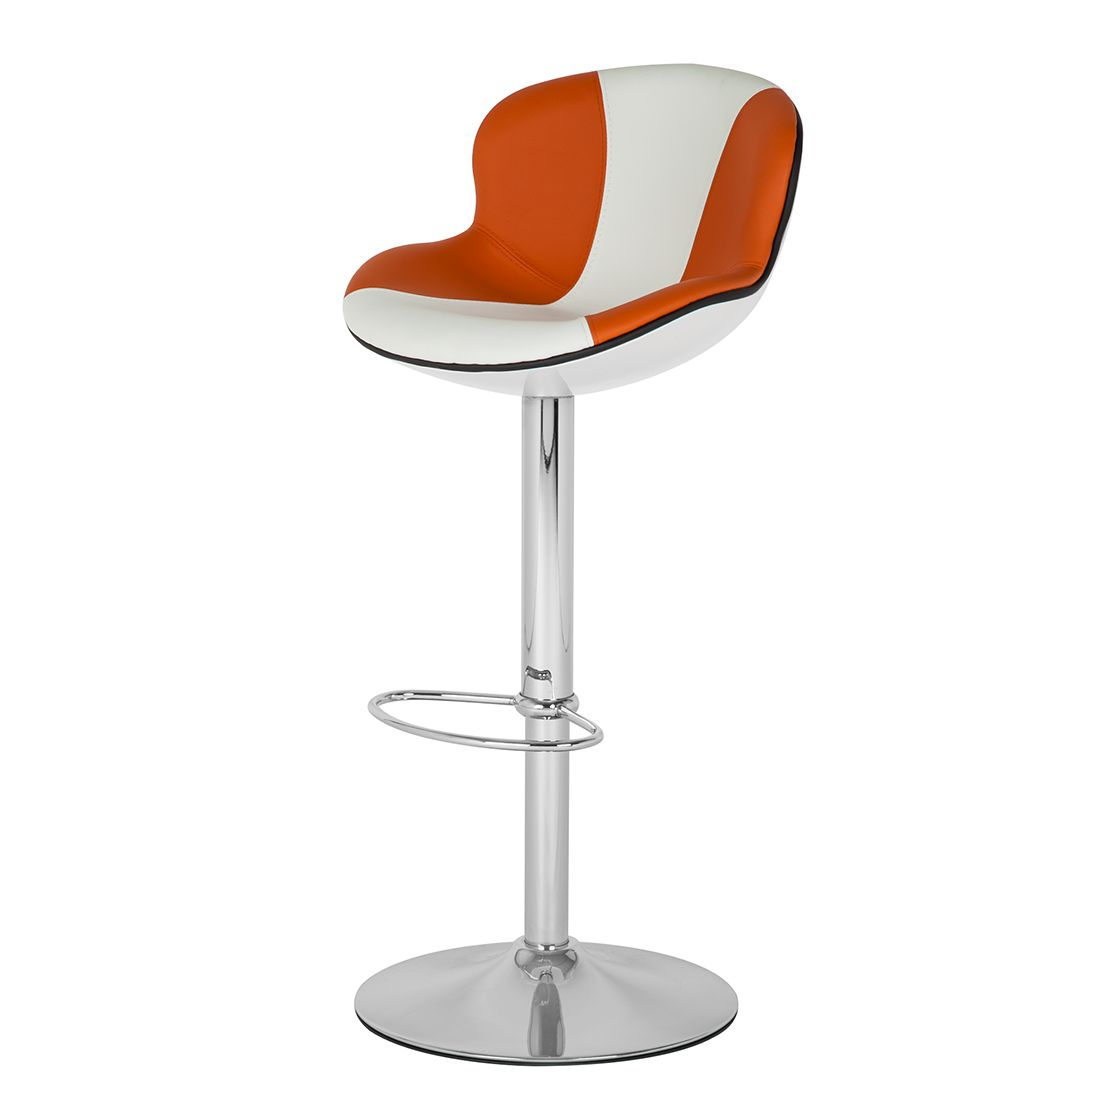 Barhocker Cancun – Kunstleder/Kunststoff – Orange/Weiß, Fredriks bestellen